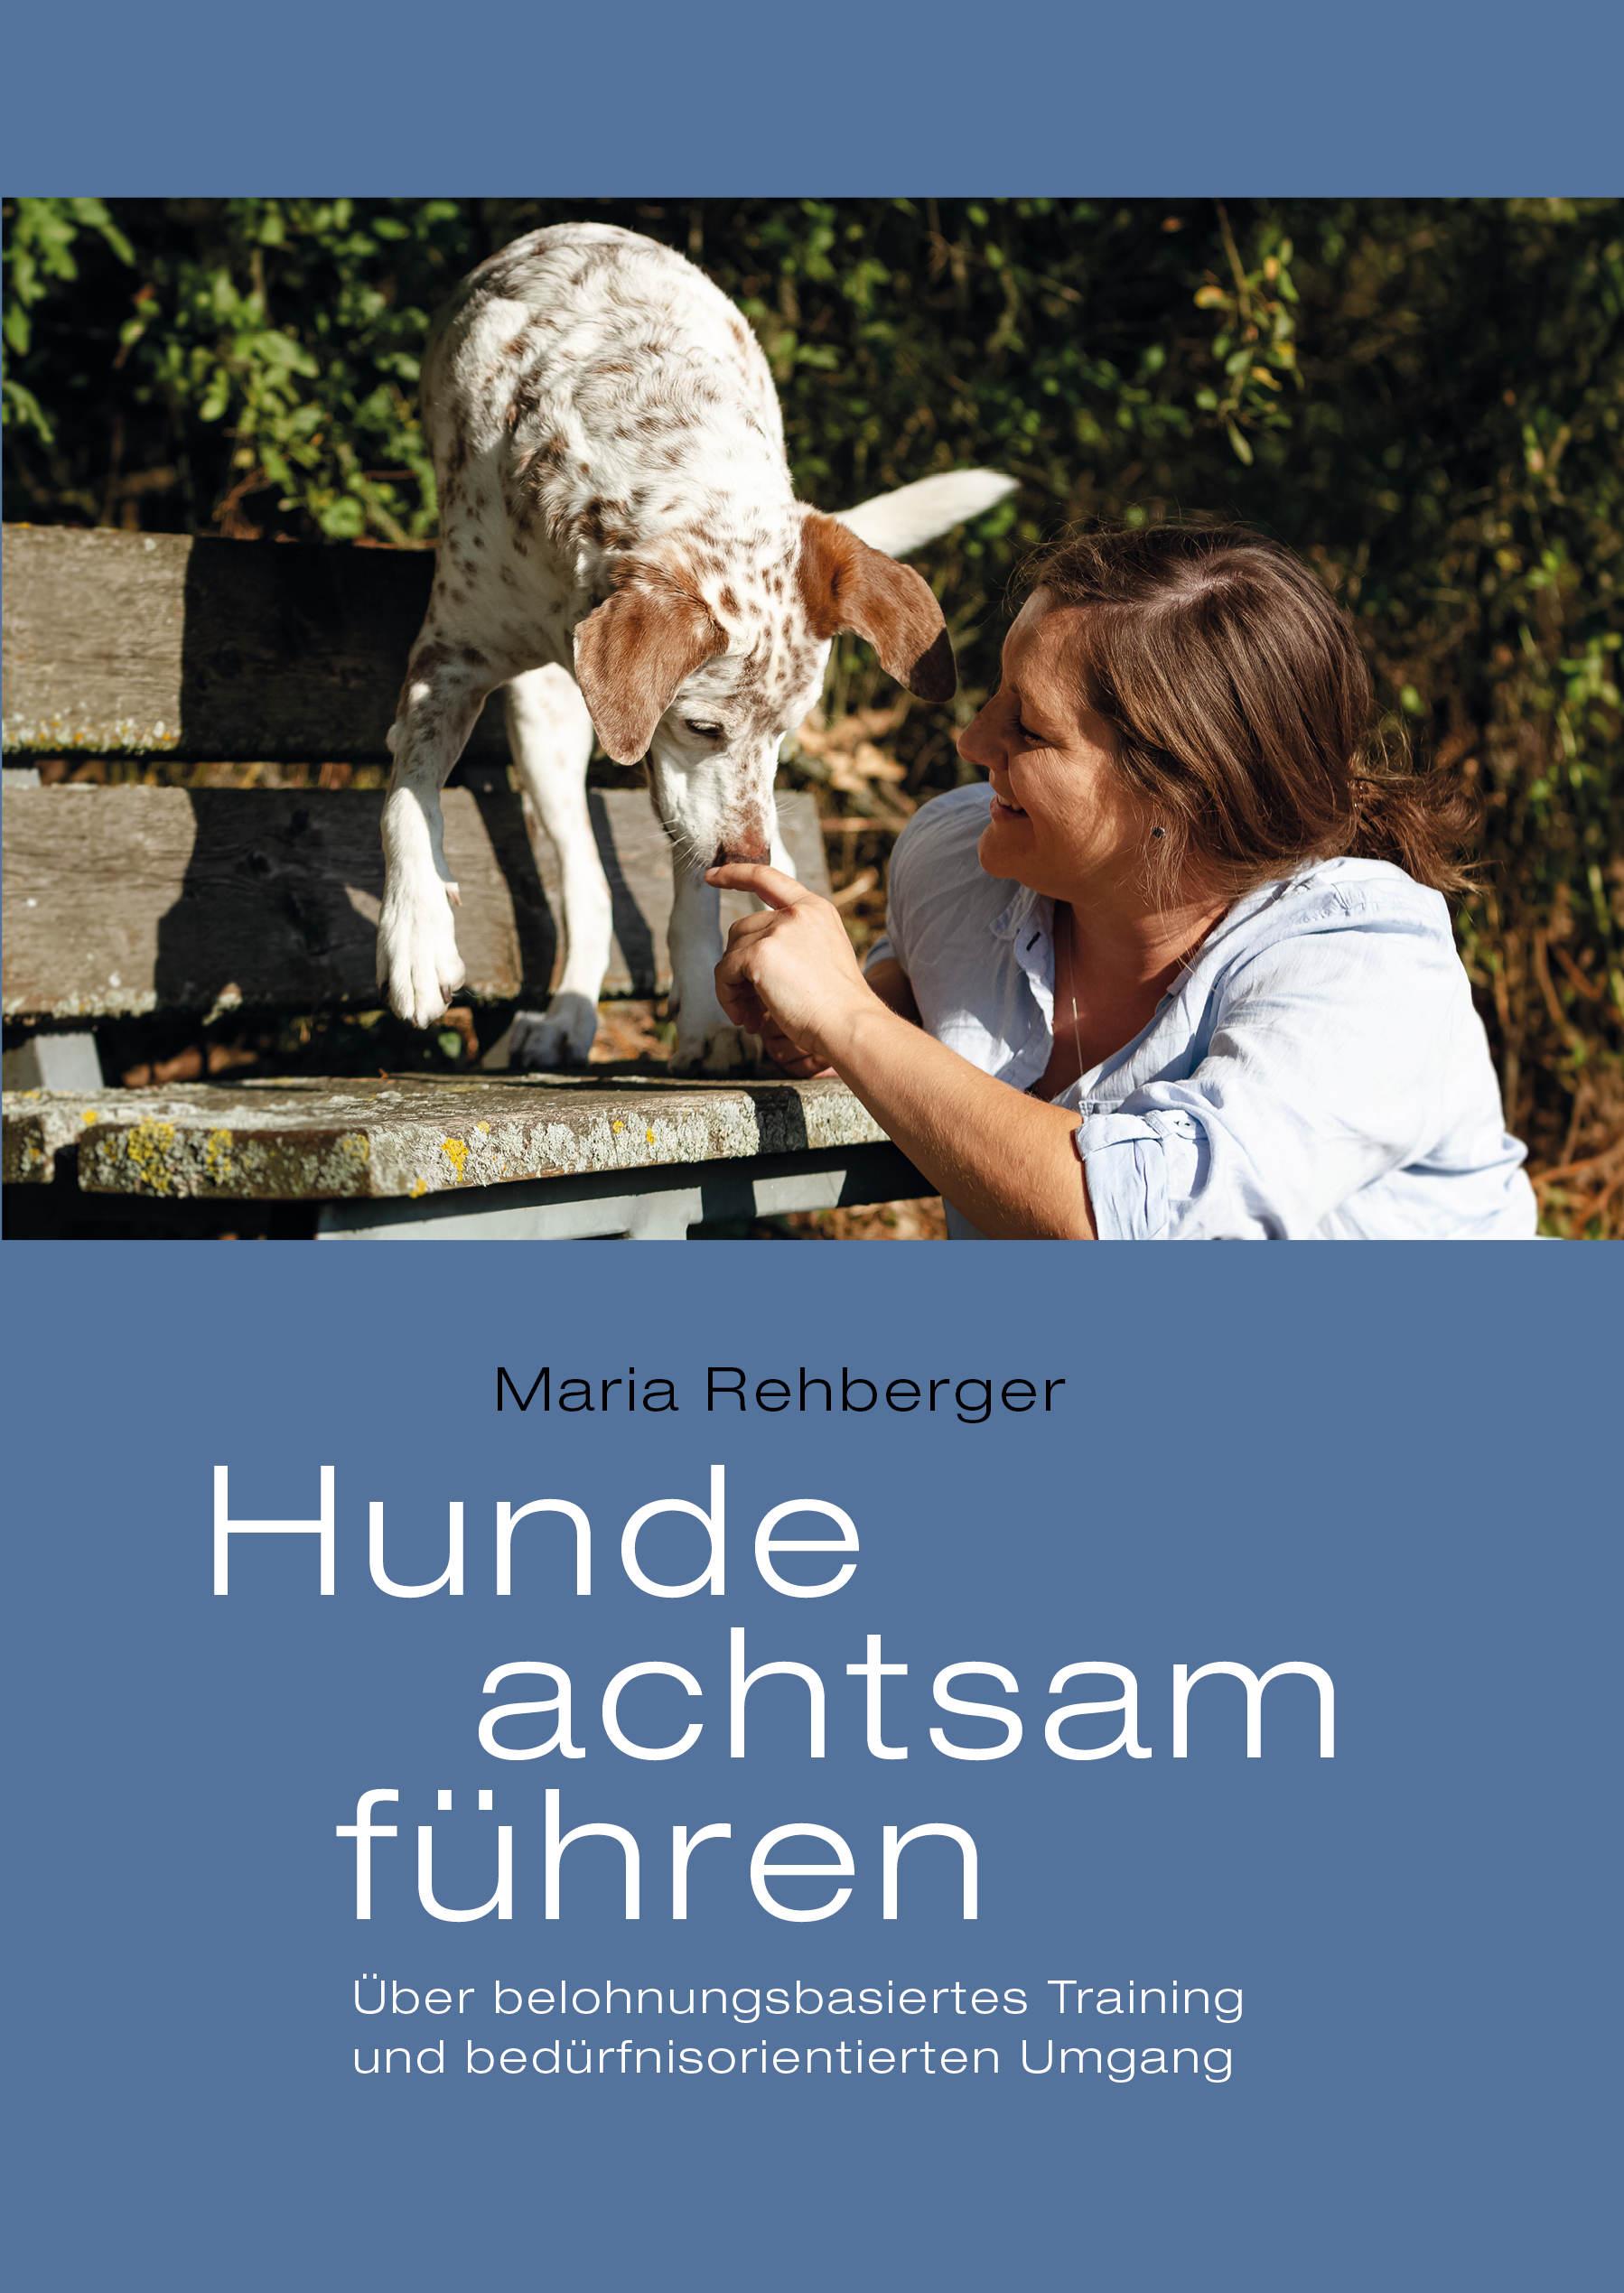 Animal Learn - Hunde achtsam führen [Maria Rehberger]